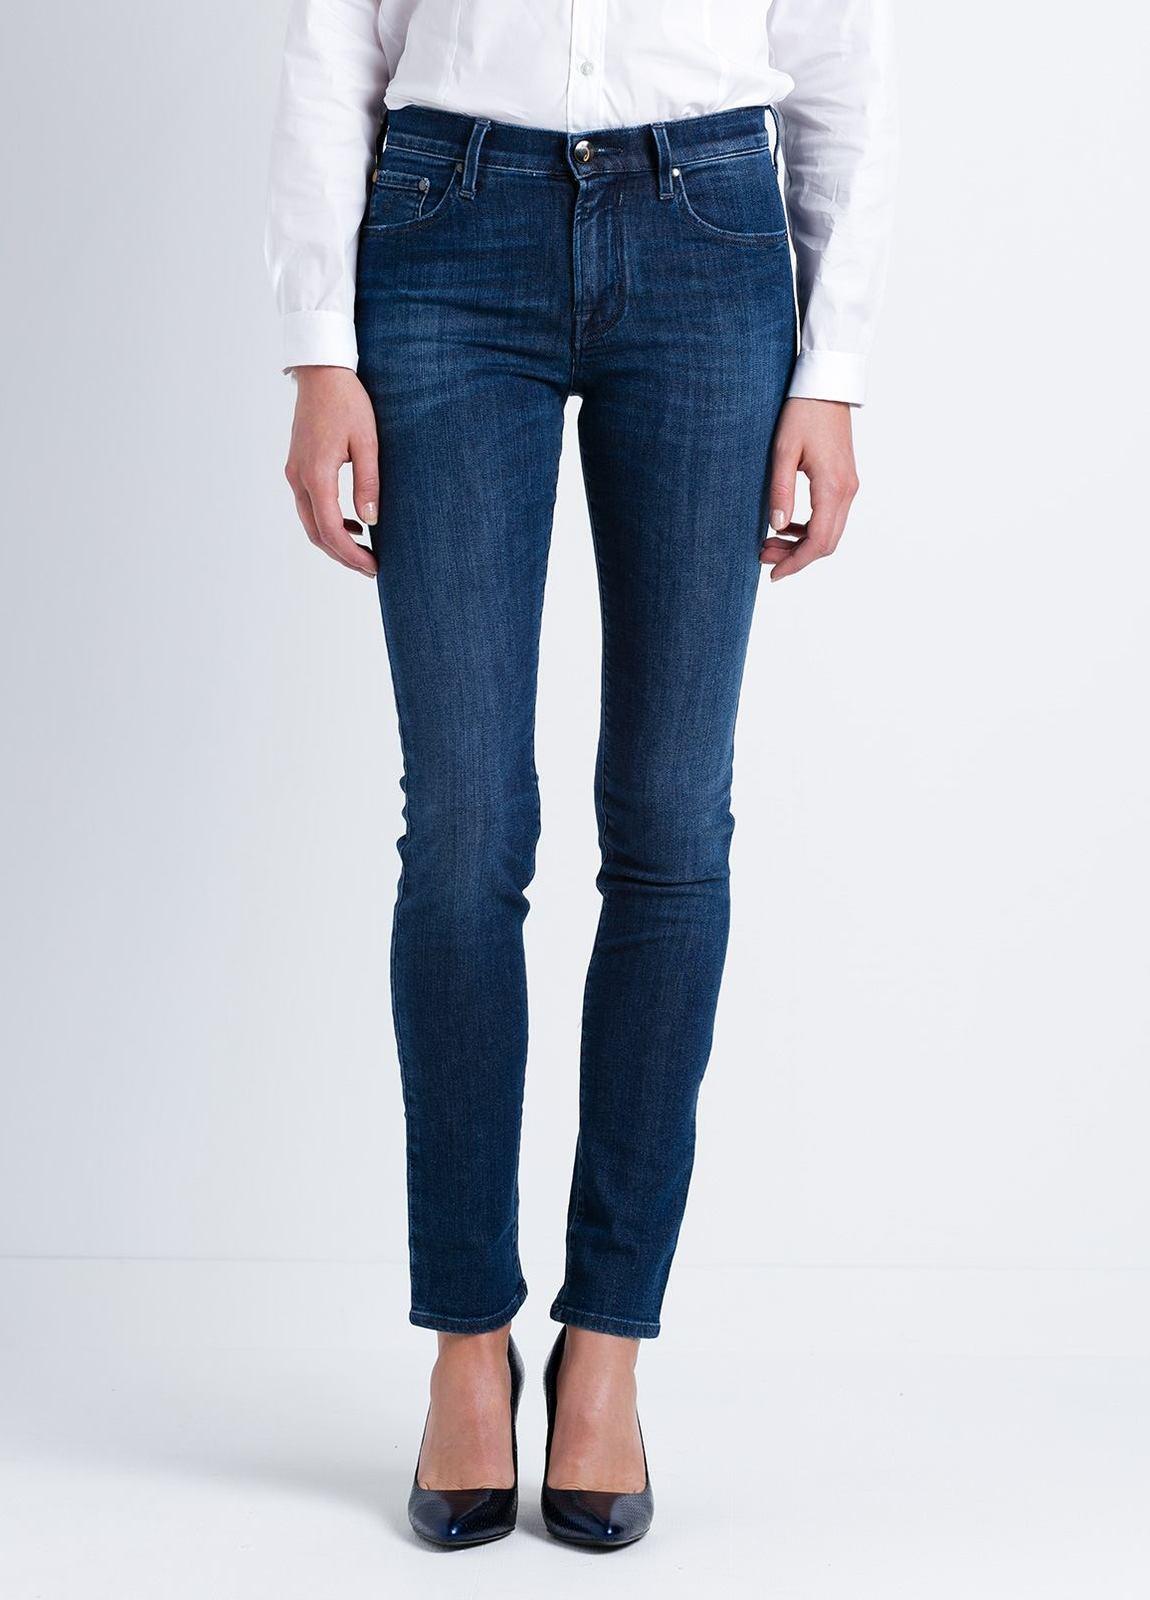 Pantalón tejano woman modelo KIMBERLY SLIM, color azul lavado.